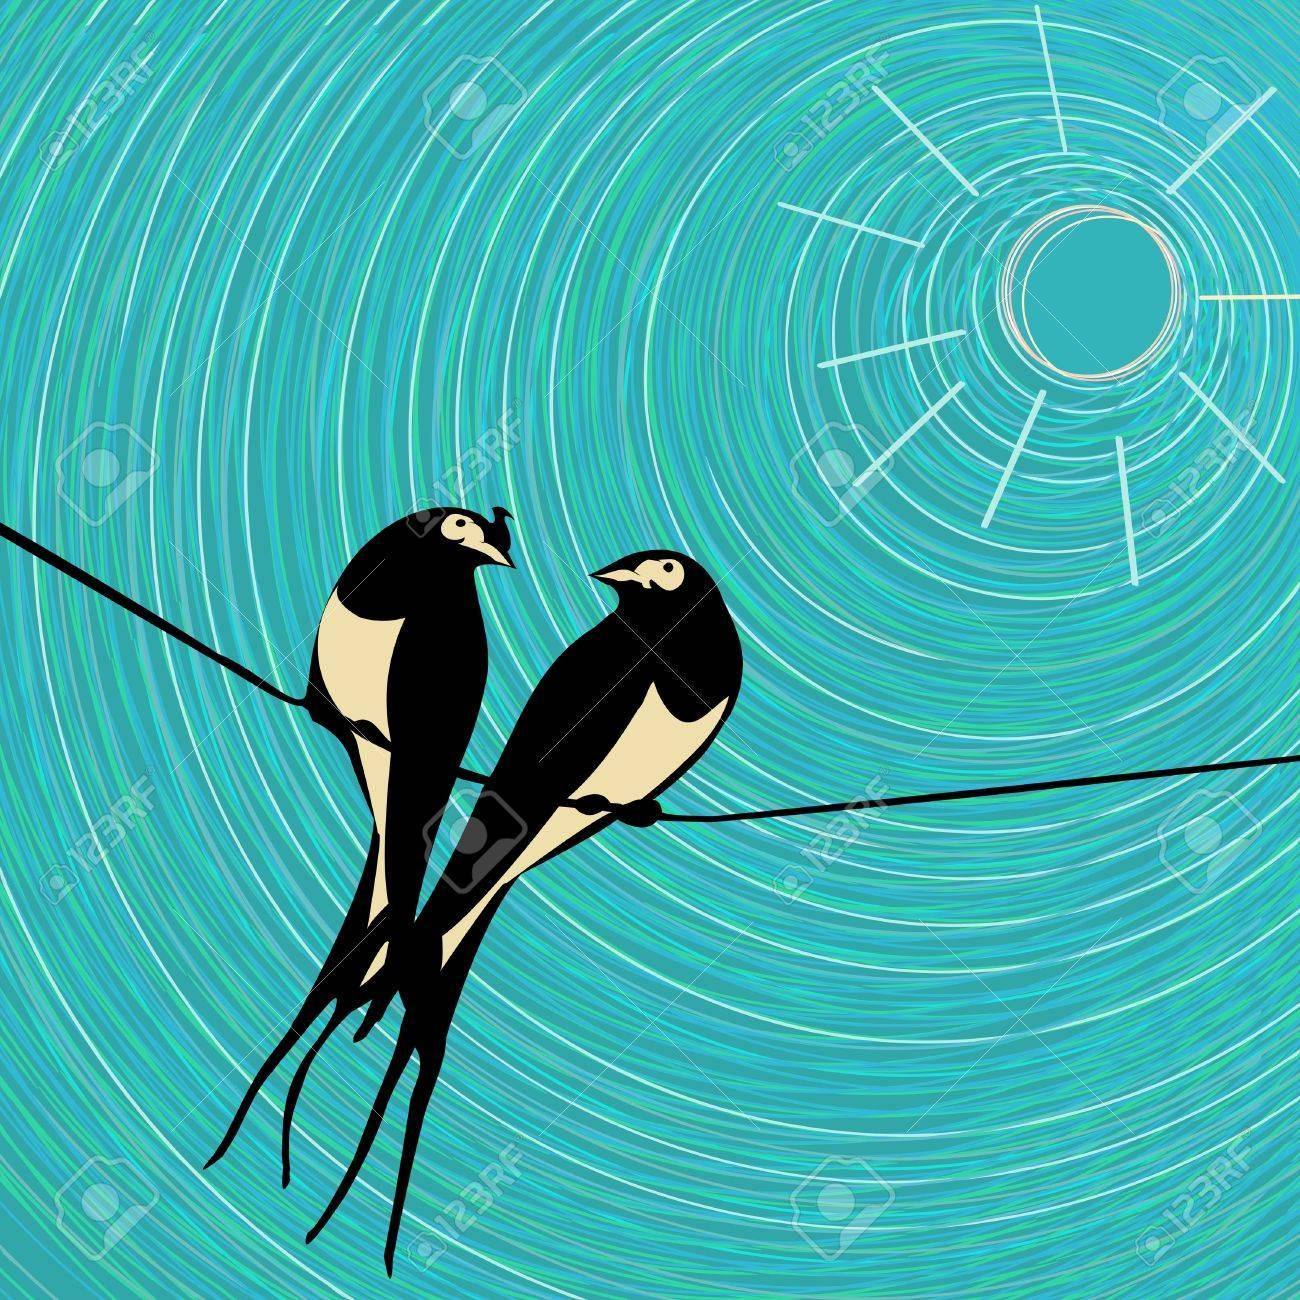 Swallows love card, graphic art Stock Vector - 16188095